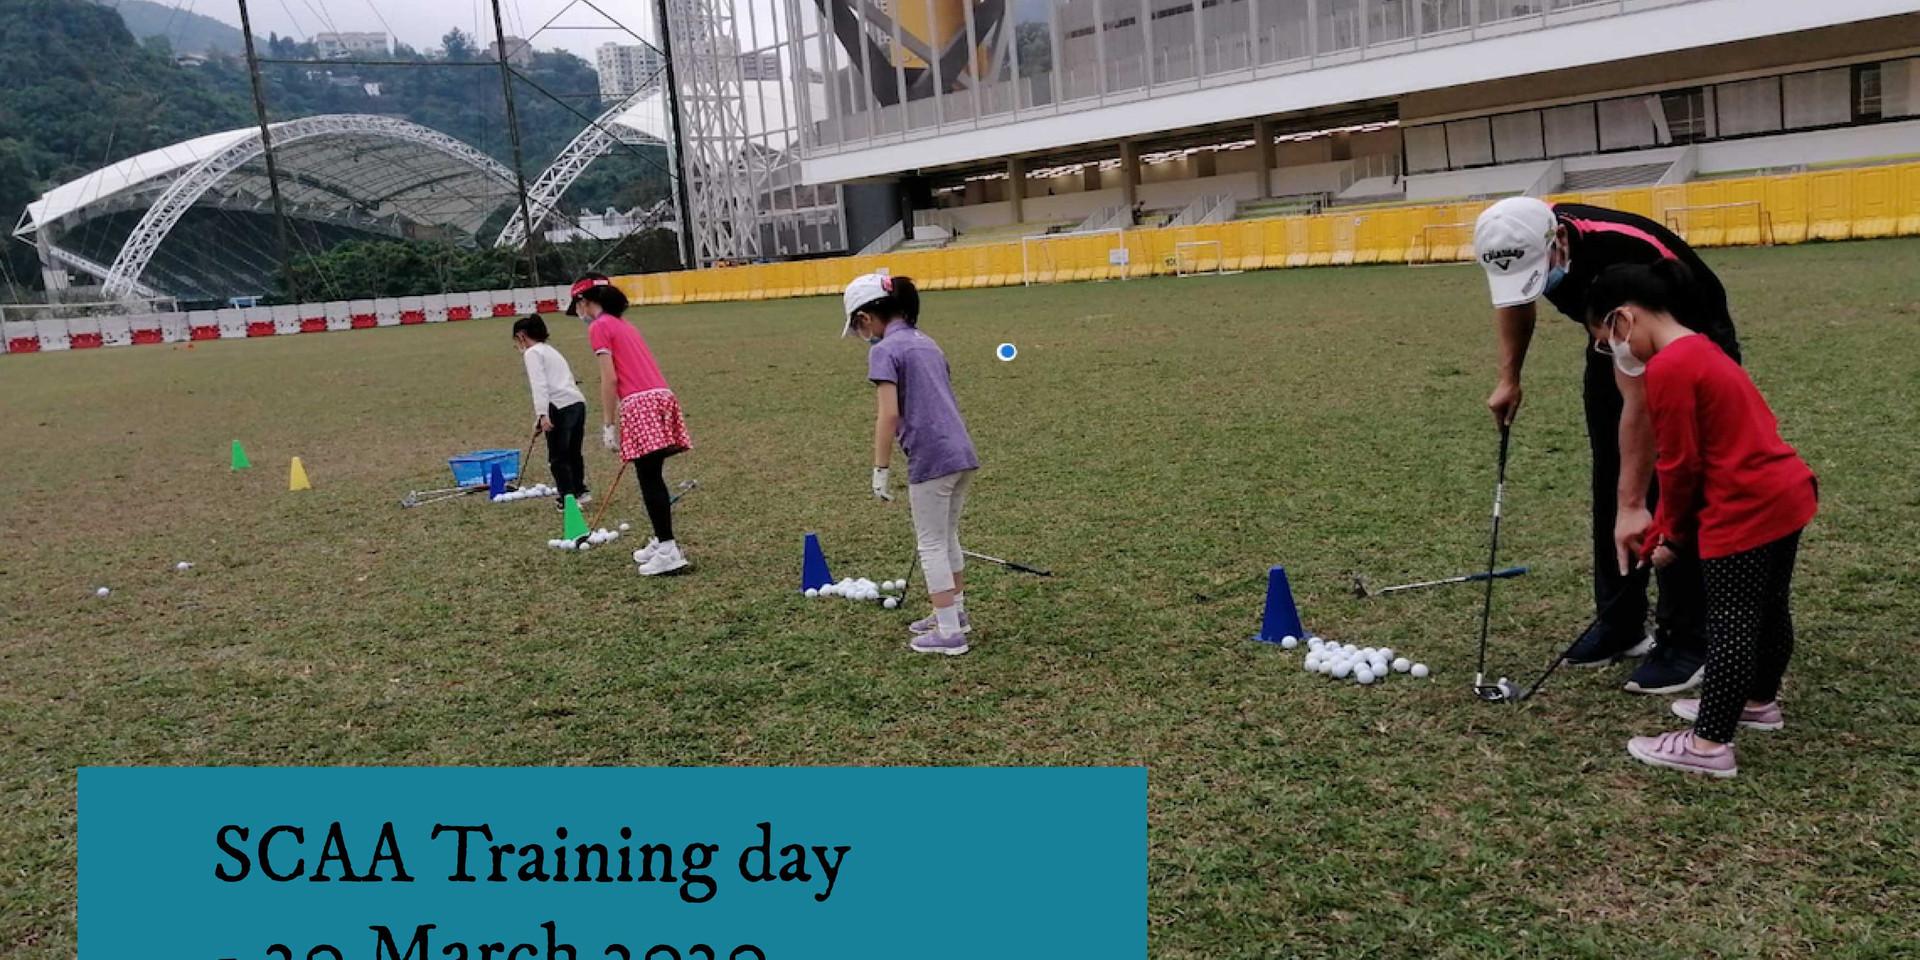 SCAA training day